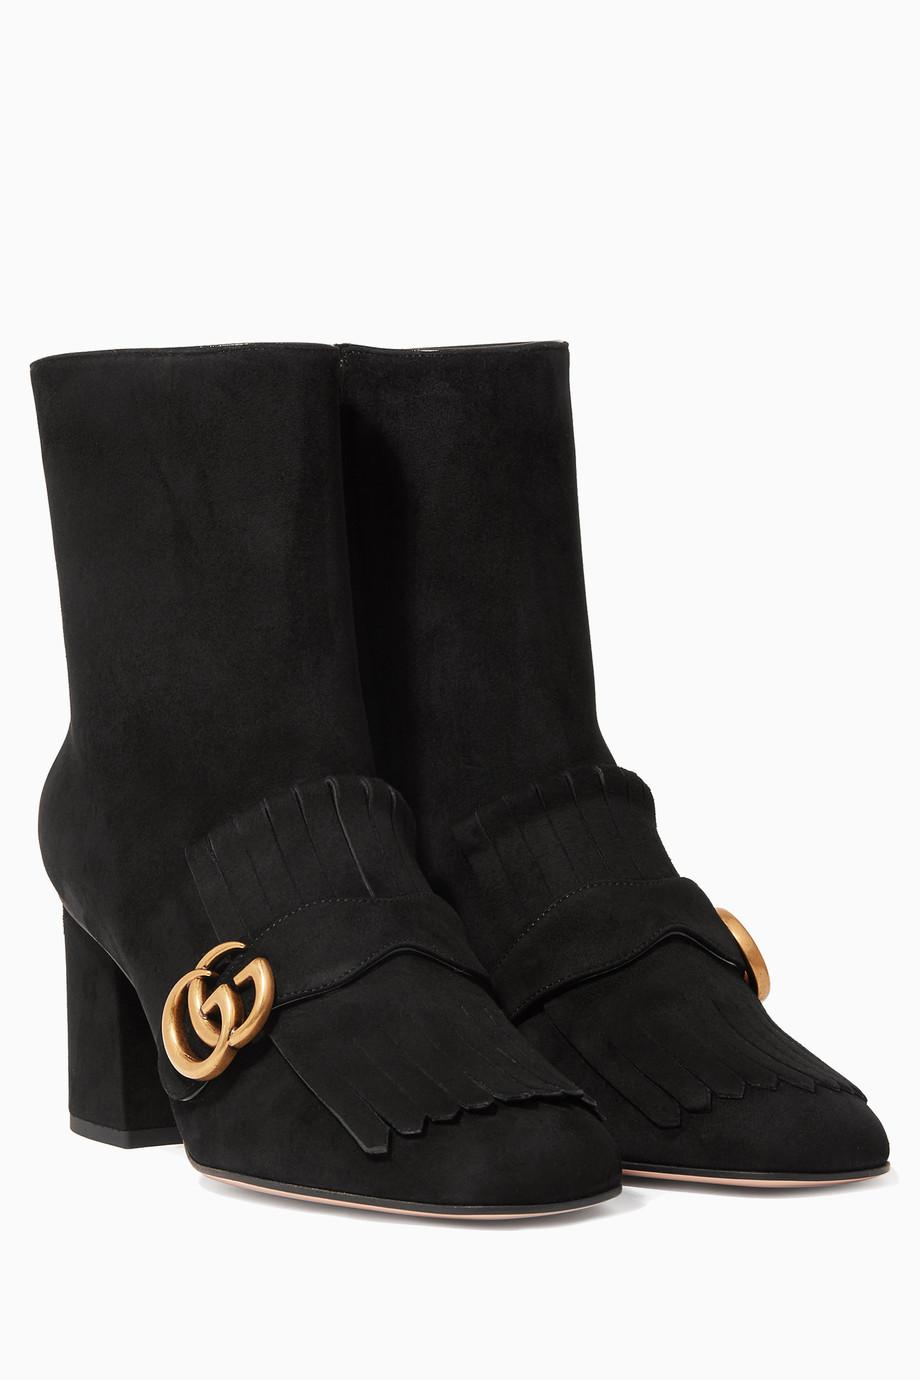 bed55de57 Shop Gucci Black Black Marmont Suede Booties for Women | Ounass